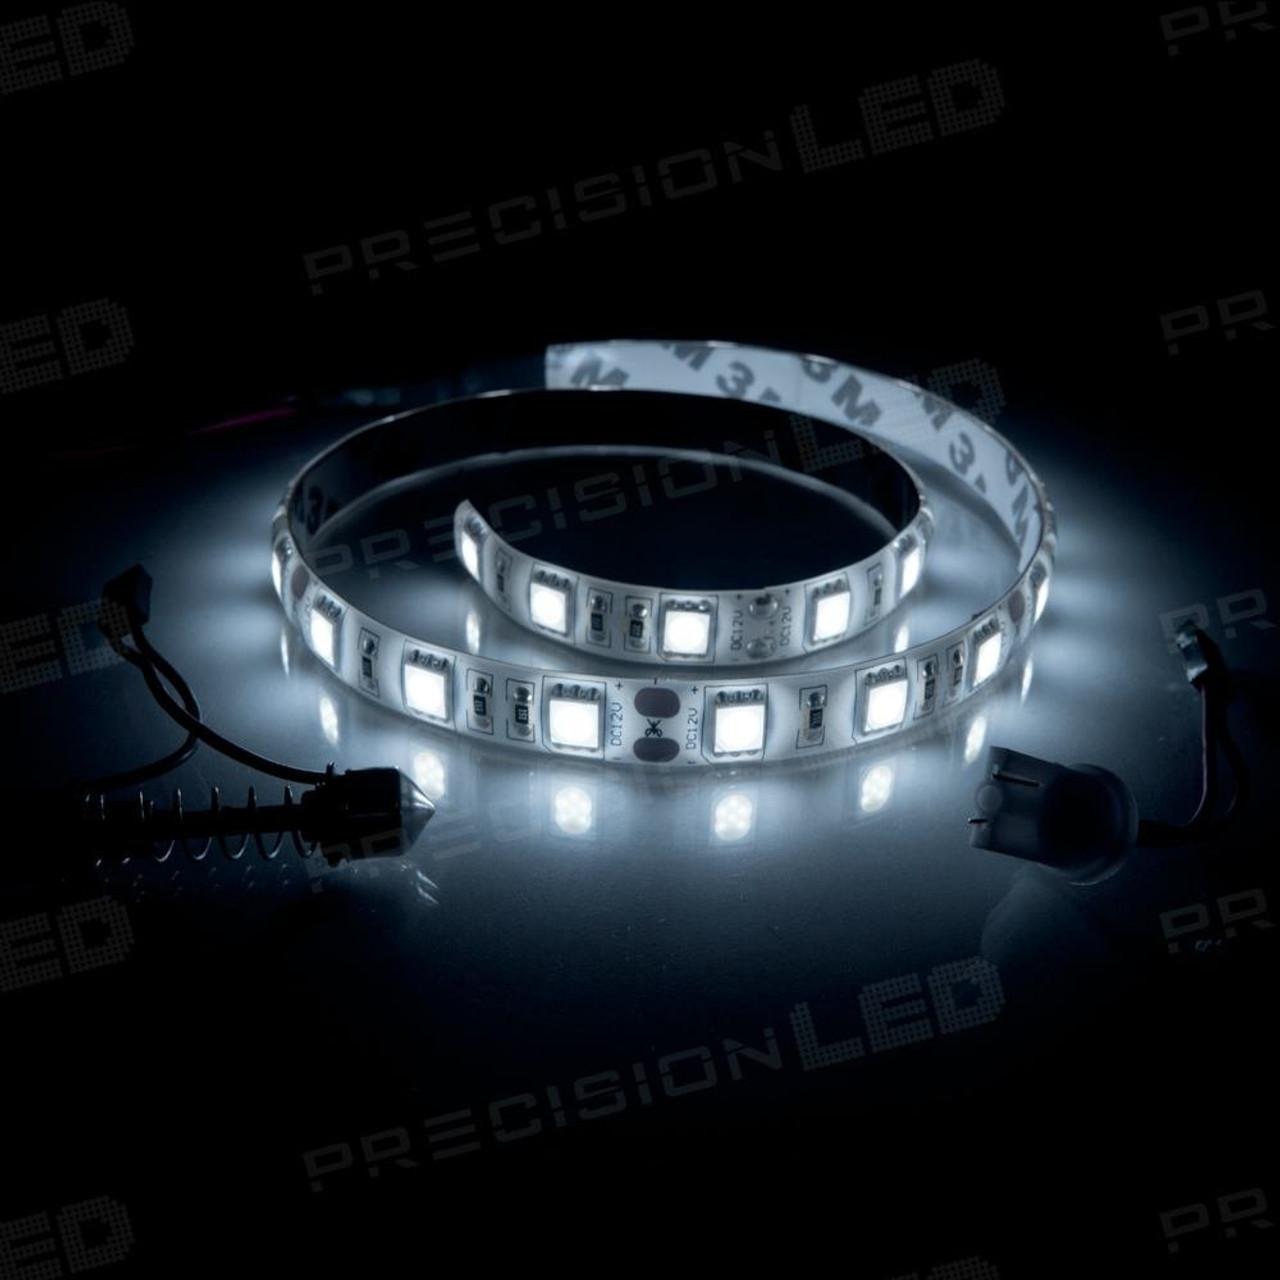 Infiniti QX56 LED Trunk Strip Light (2004-2010)